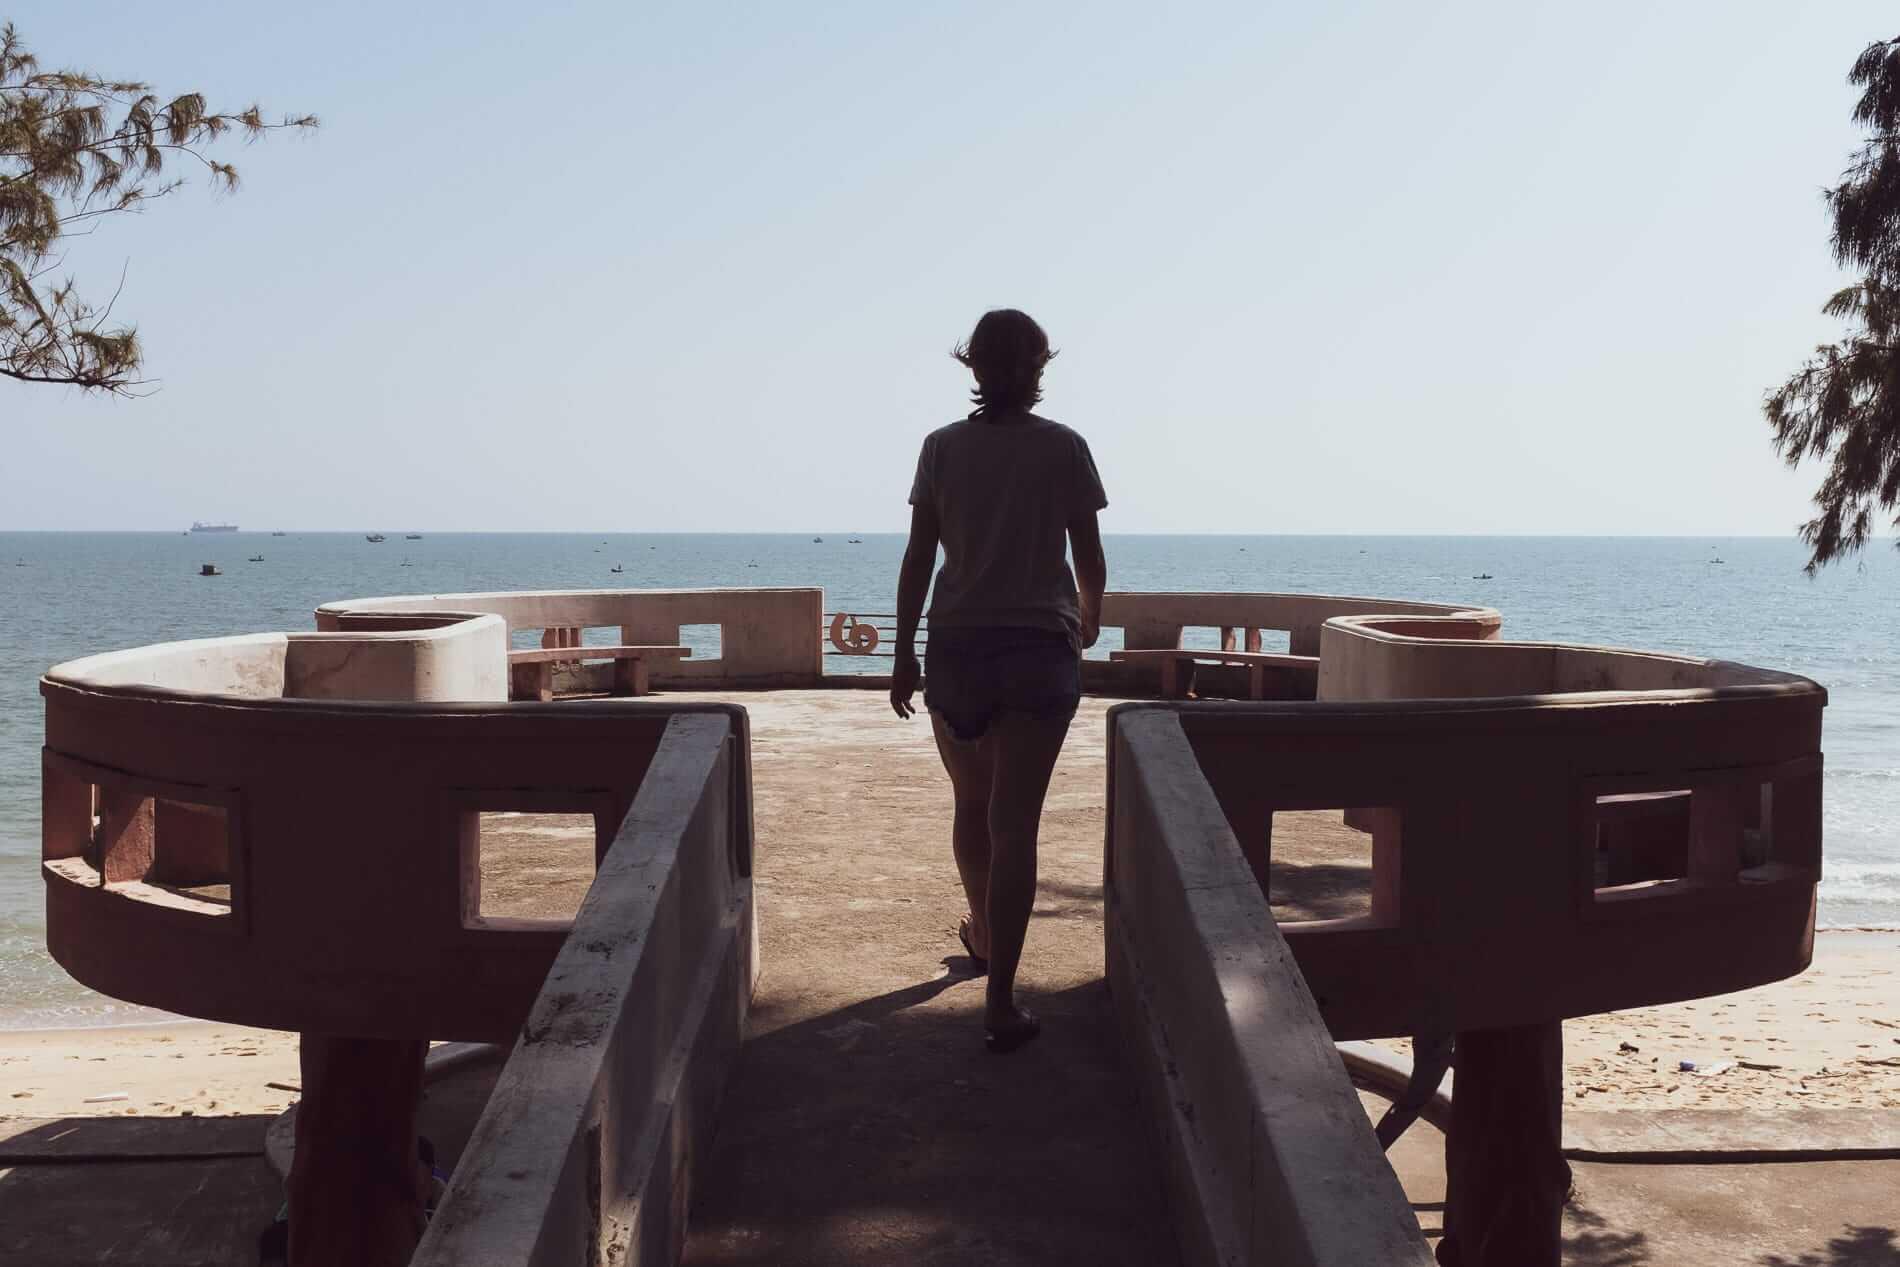 Quy Hoa ex-leper colony on Queen's Beach